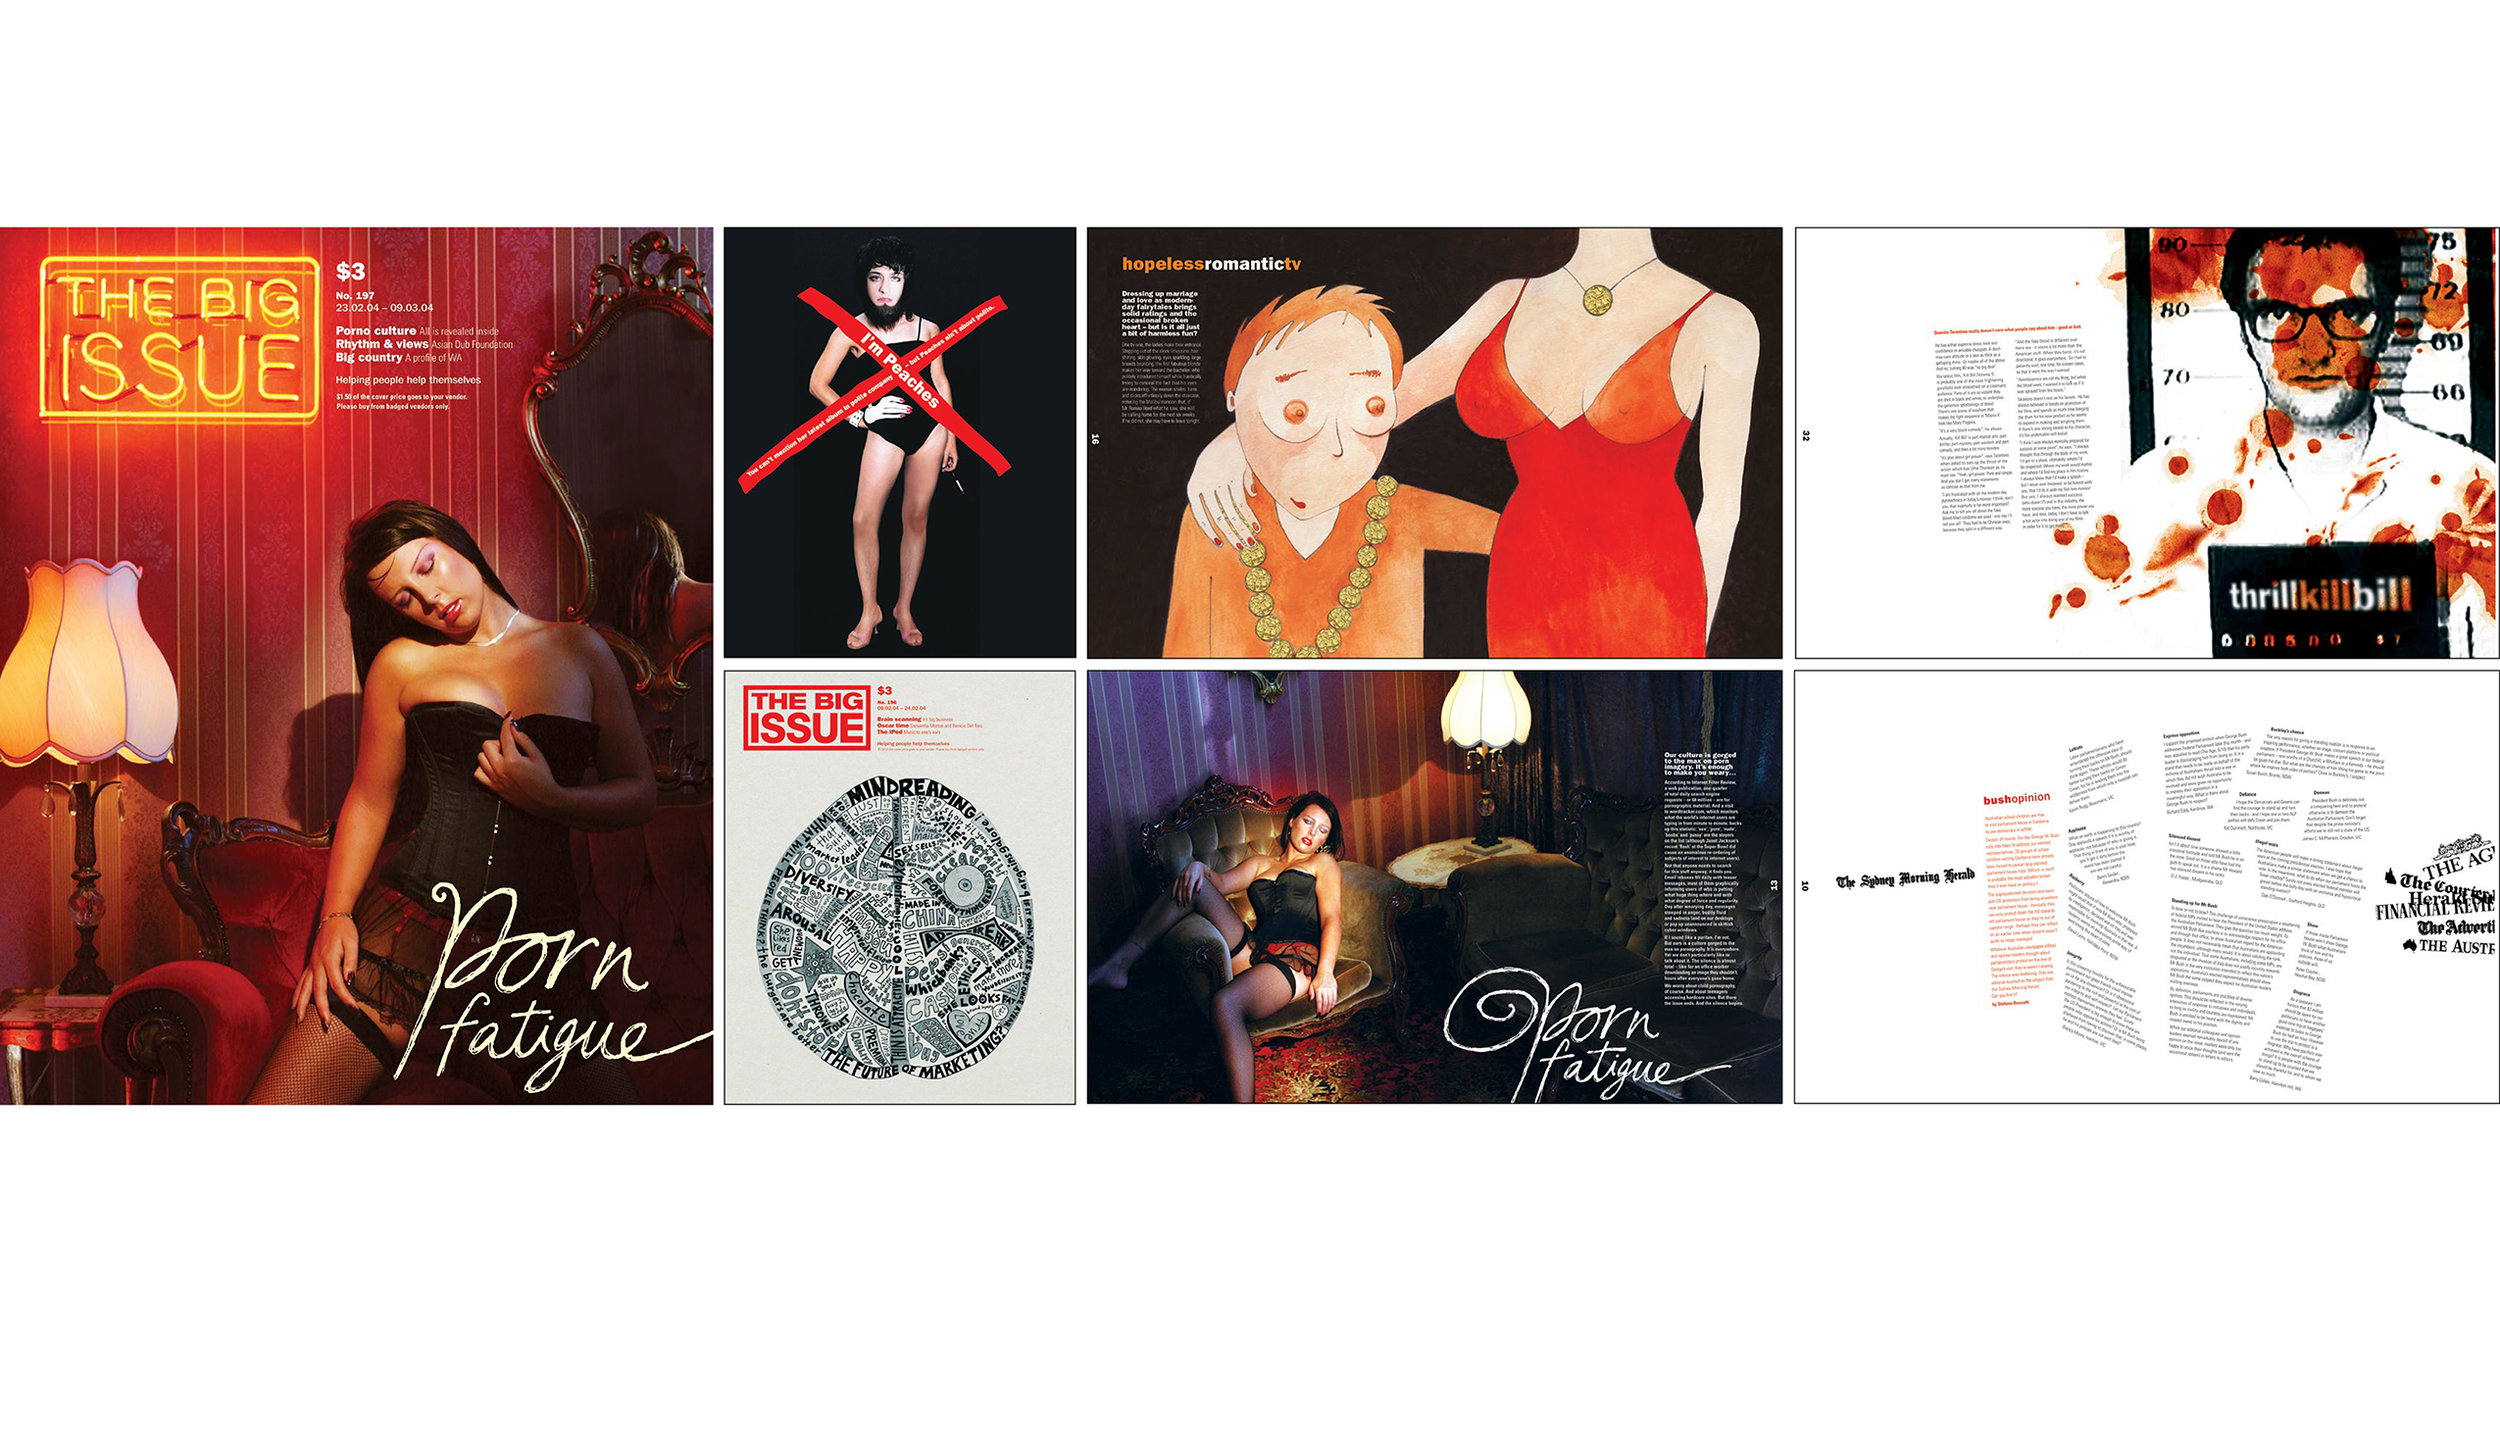 THE BIG ISSUE    Award-winning Australian magazine design     Heidi Green: Art director, Illustrator